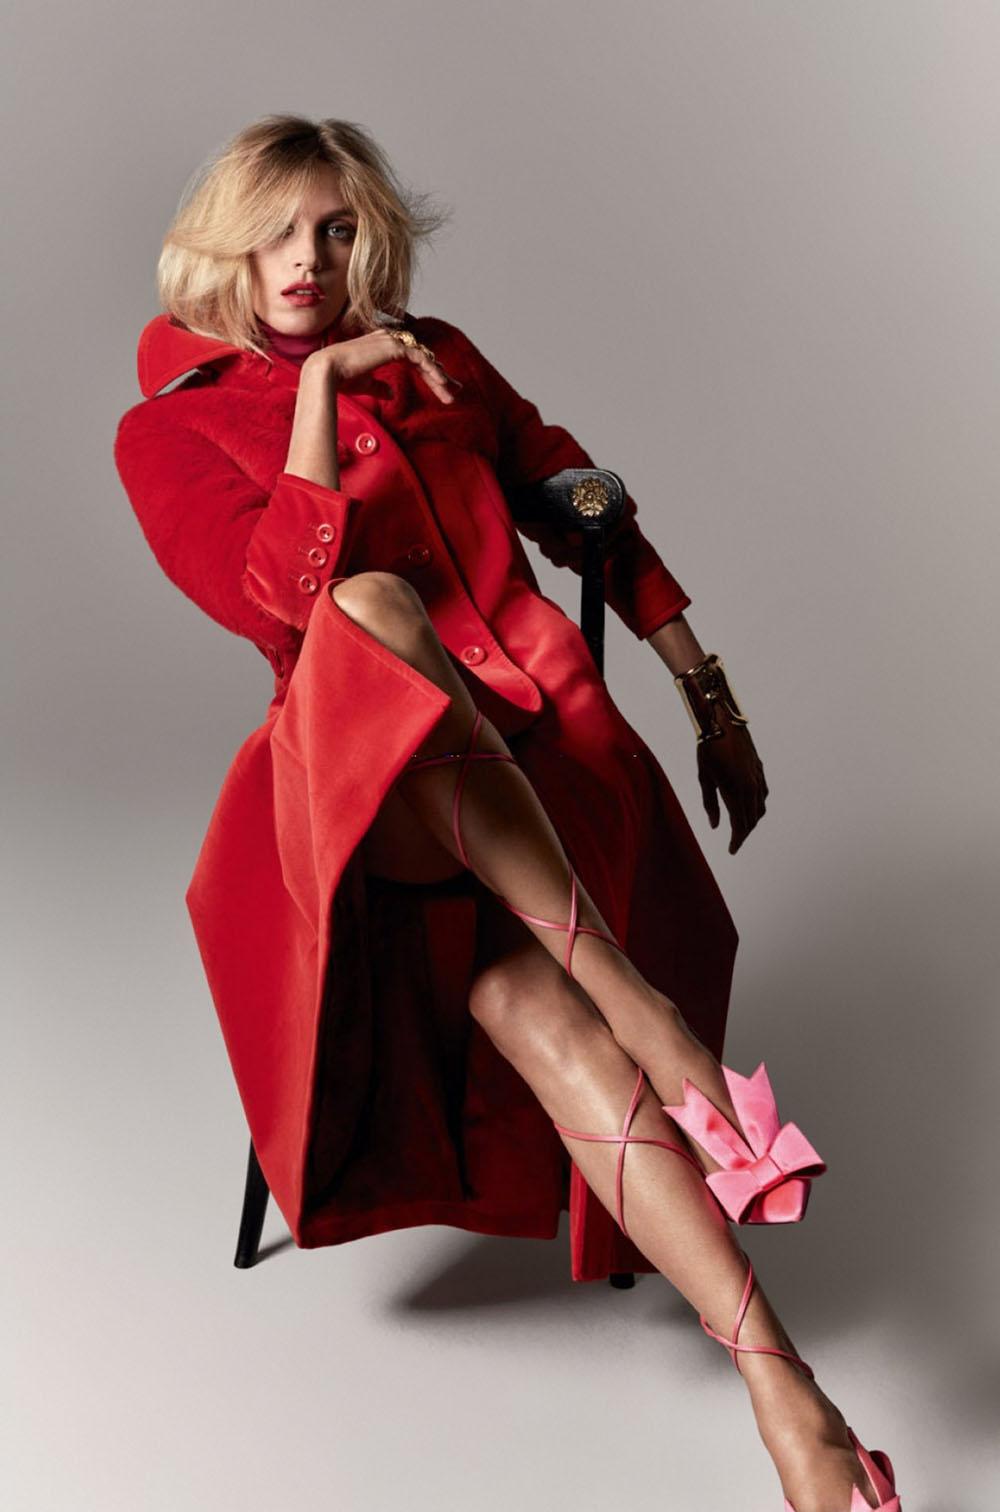 Anja Rubik by Julien Martinez Leclerc for Vogue Paris May/June 2020